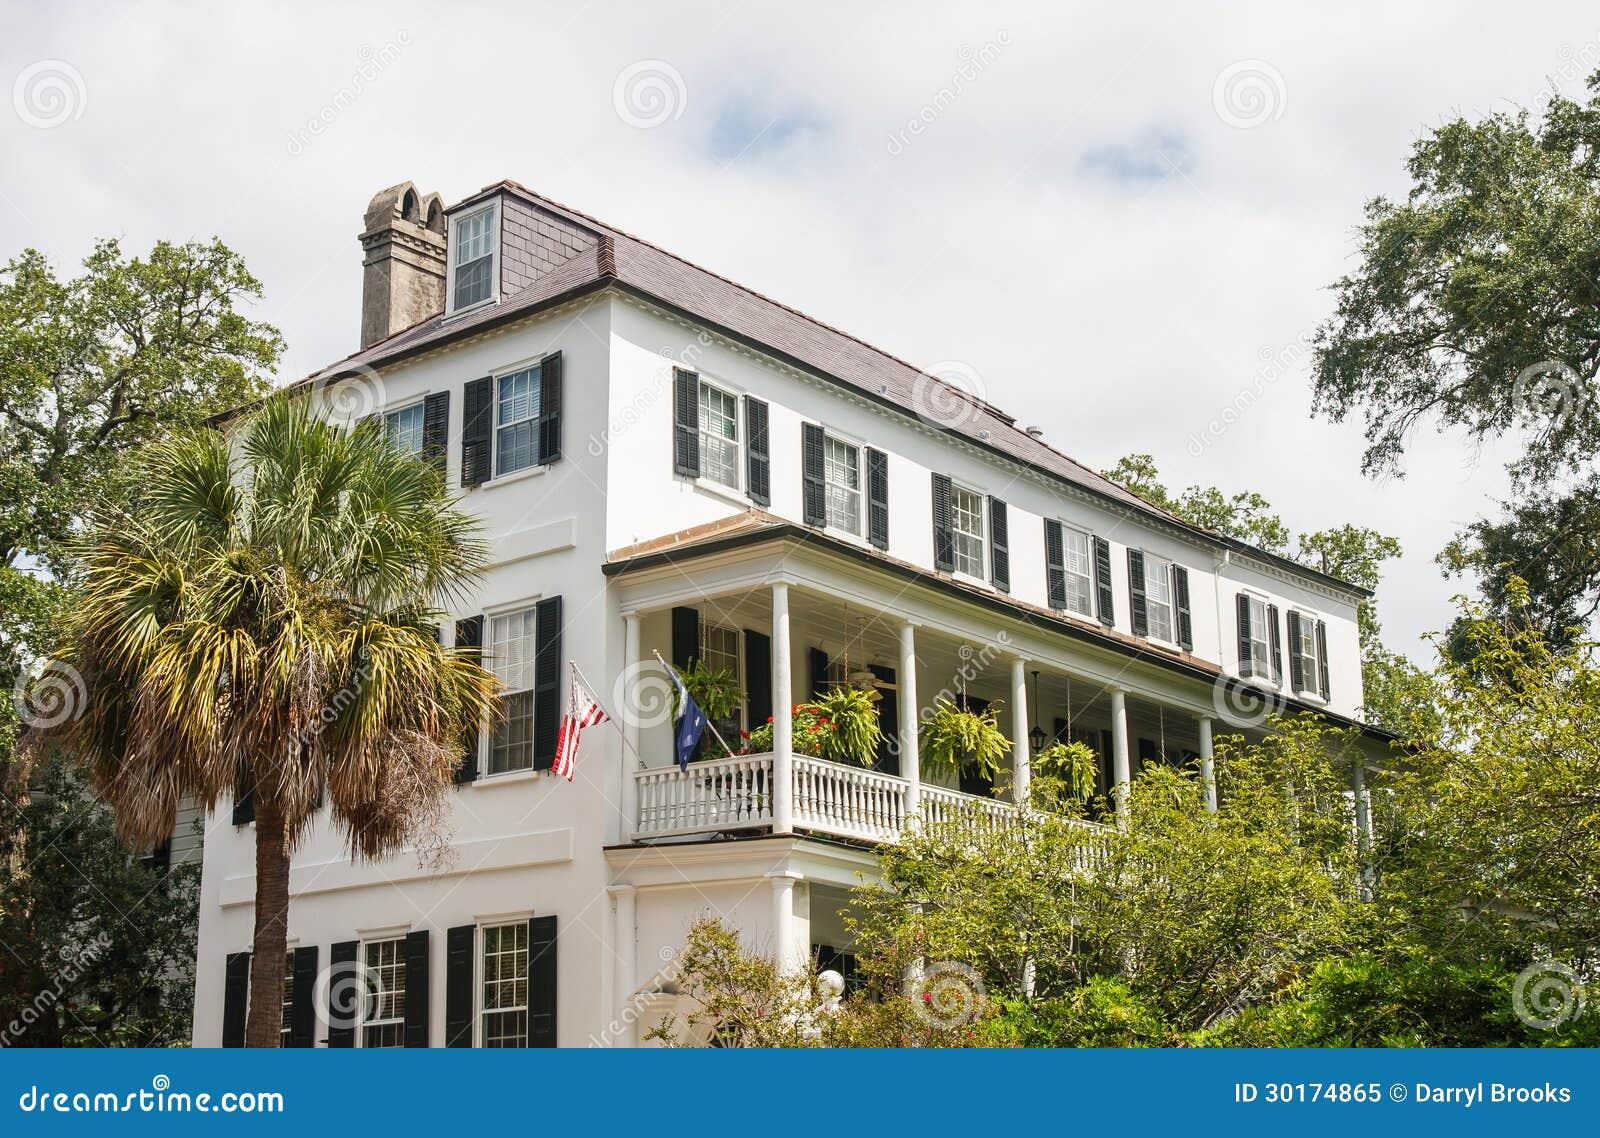 Witte huis met veranda op eerste verdieping royalty vrije stock foto afbeelding 30174865 - Huis met veranda binnenkomst ...